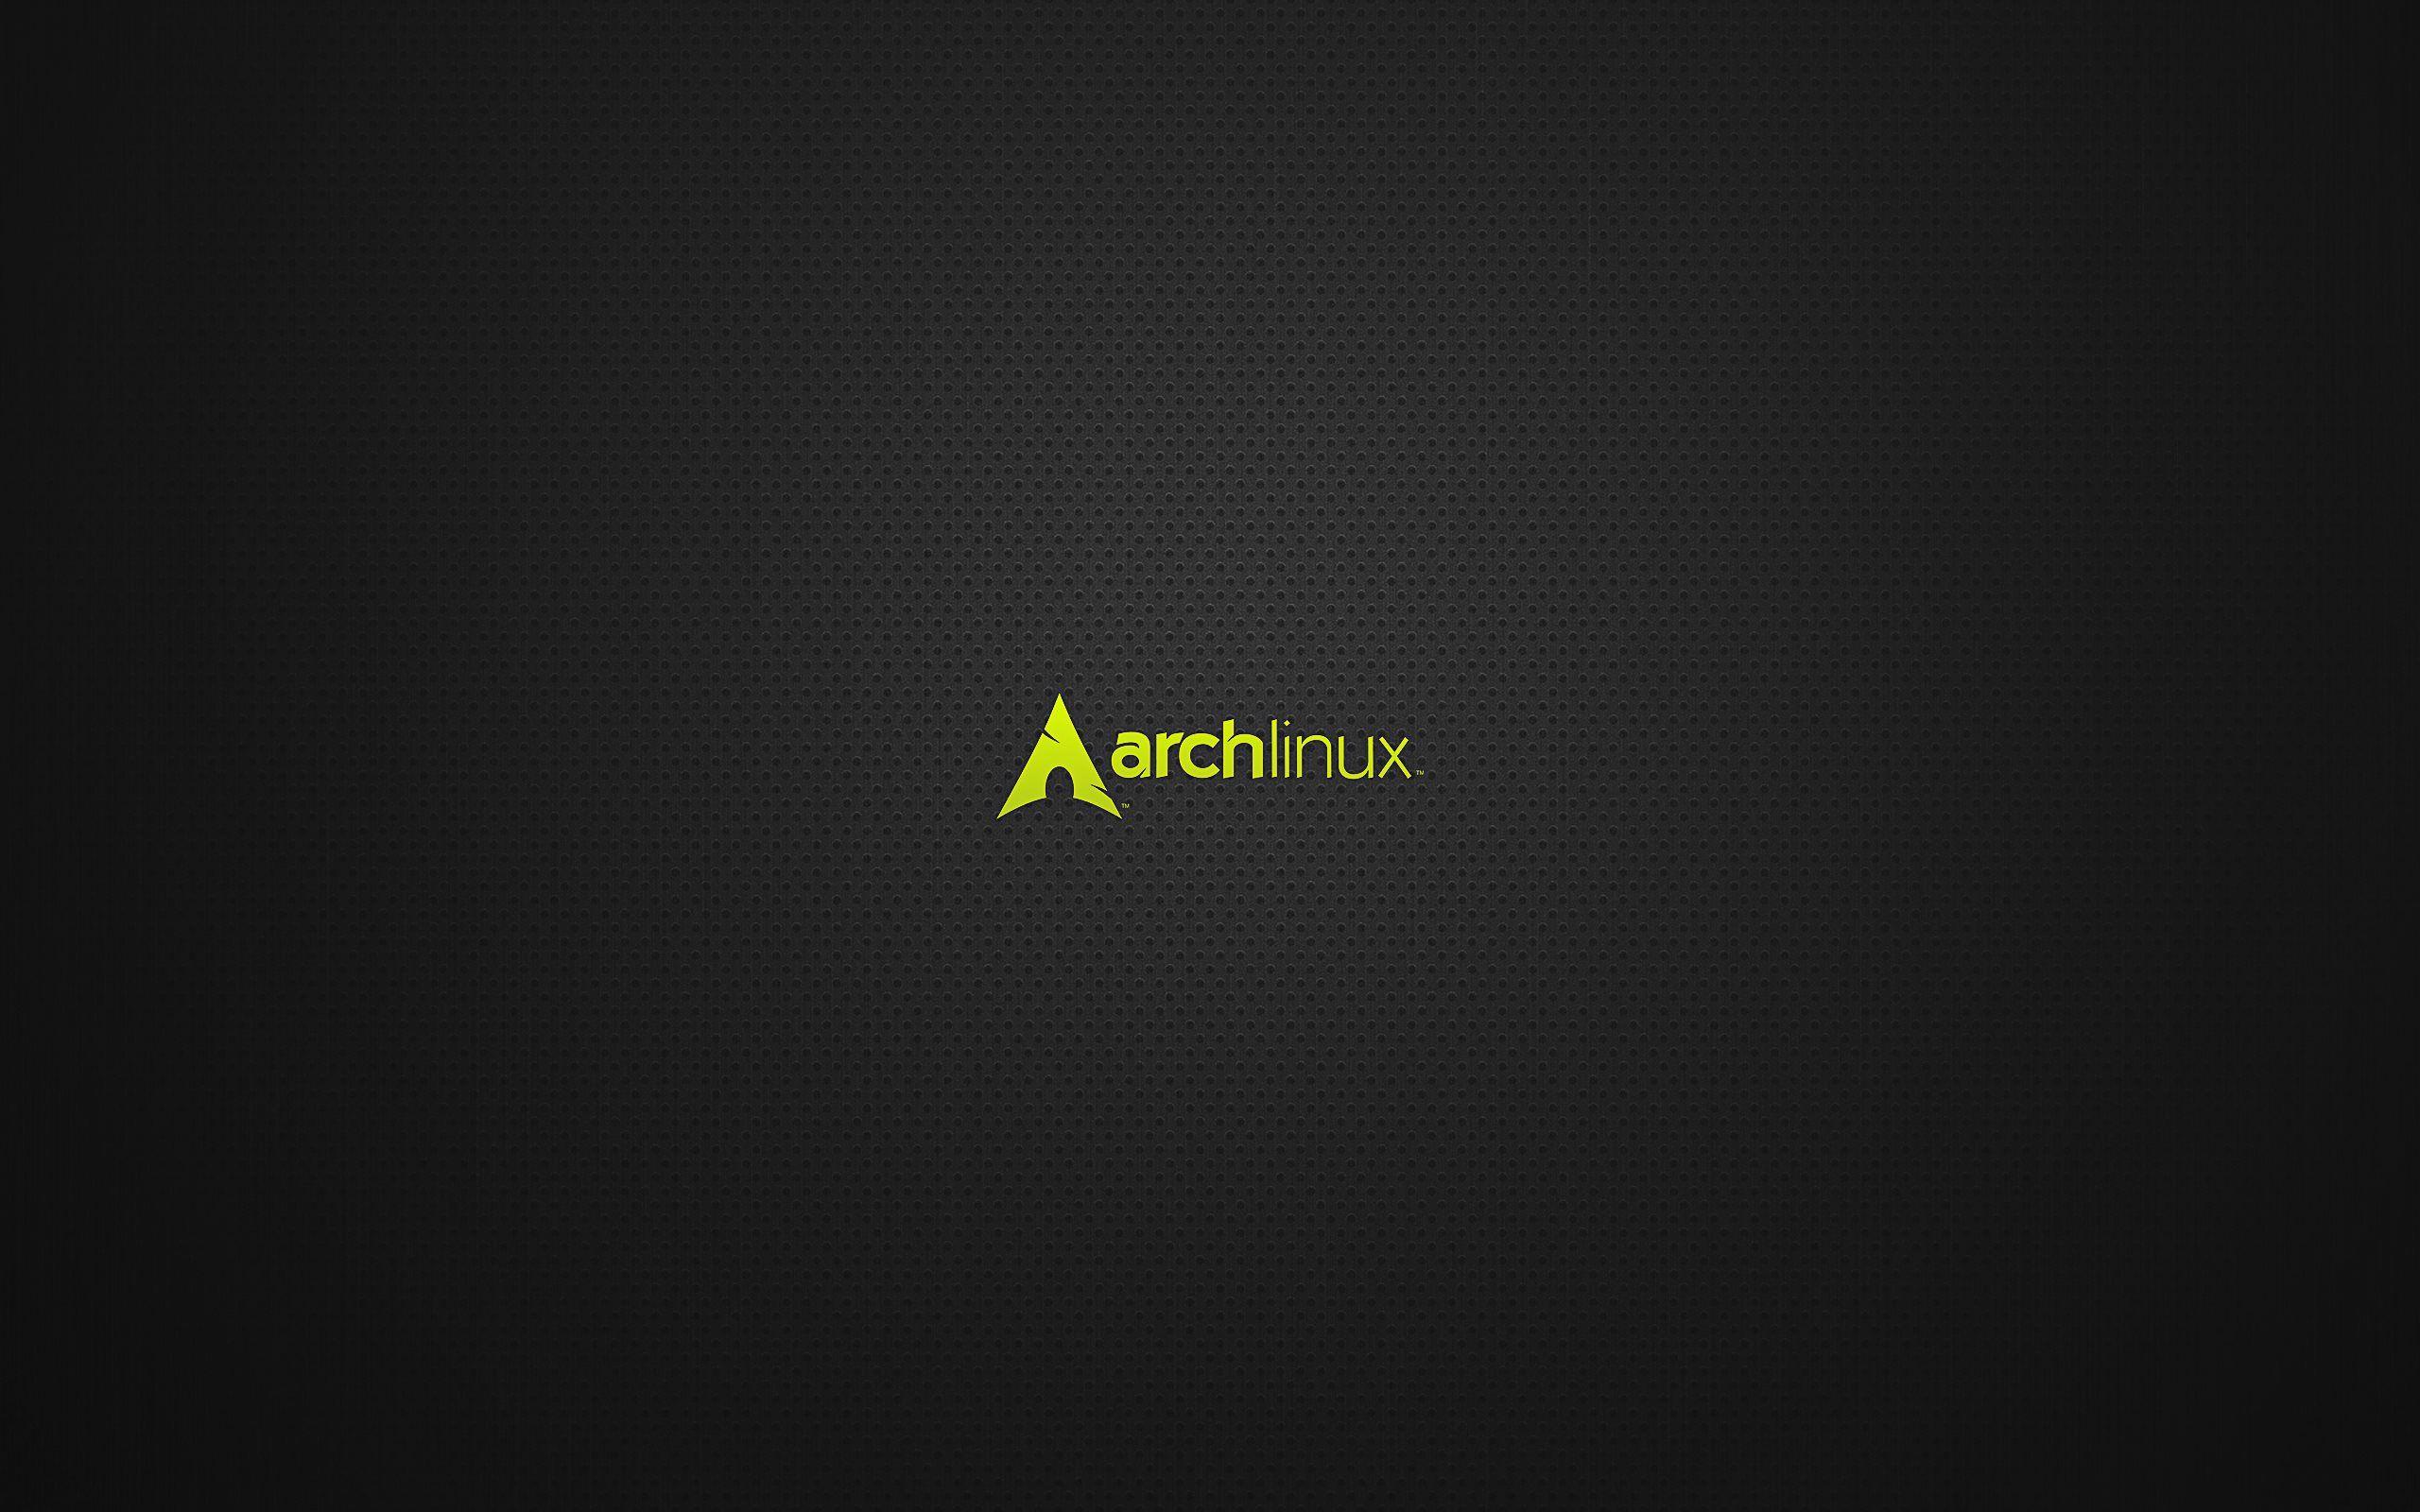 Arch Linux Black Hd Wallpaper Linux Black Hd Wallpaper Wallpaper